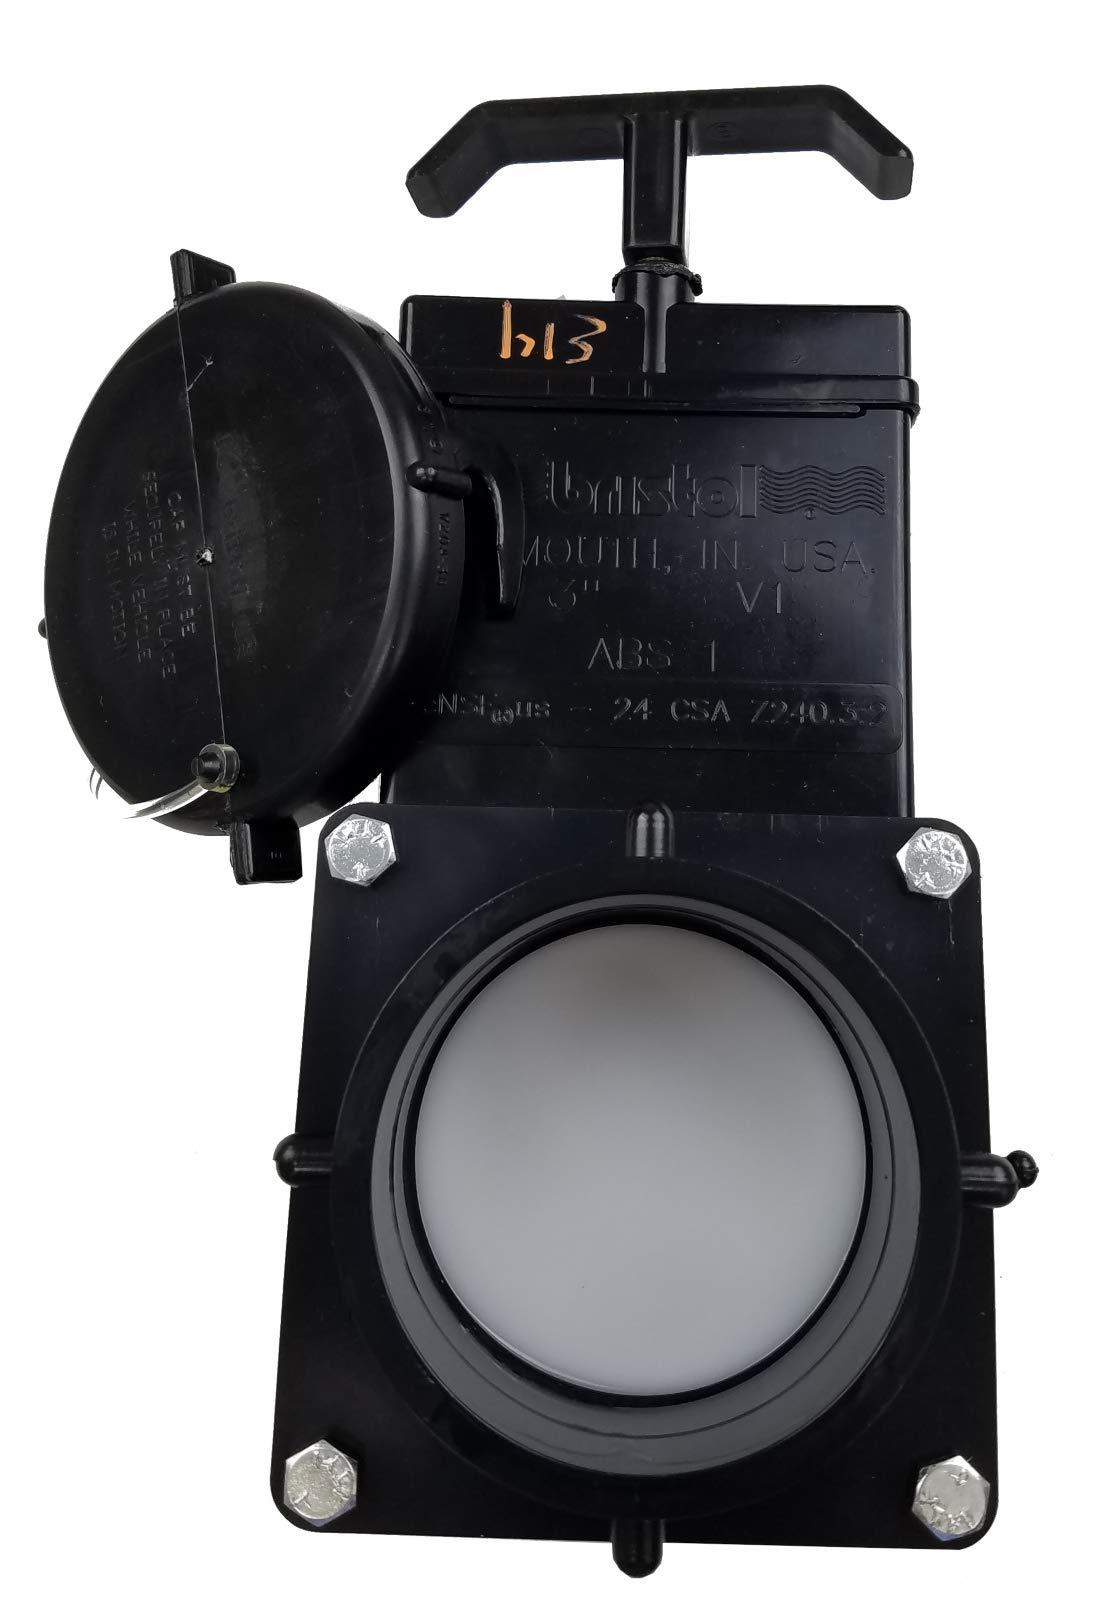 Bristol Dump Waste Valve for RV Water Tank 3 inch Hub to Lug with Cap by Bristol